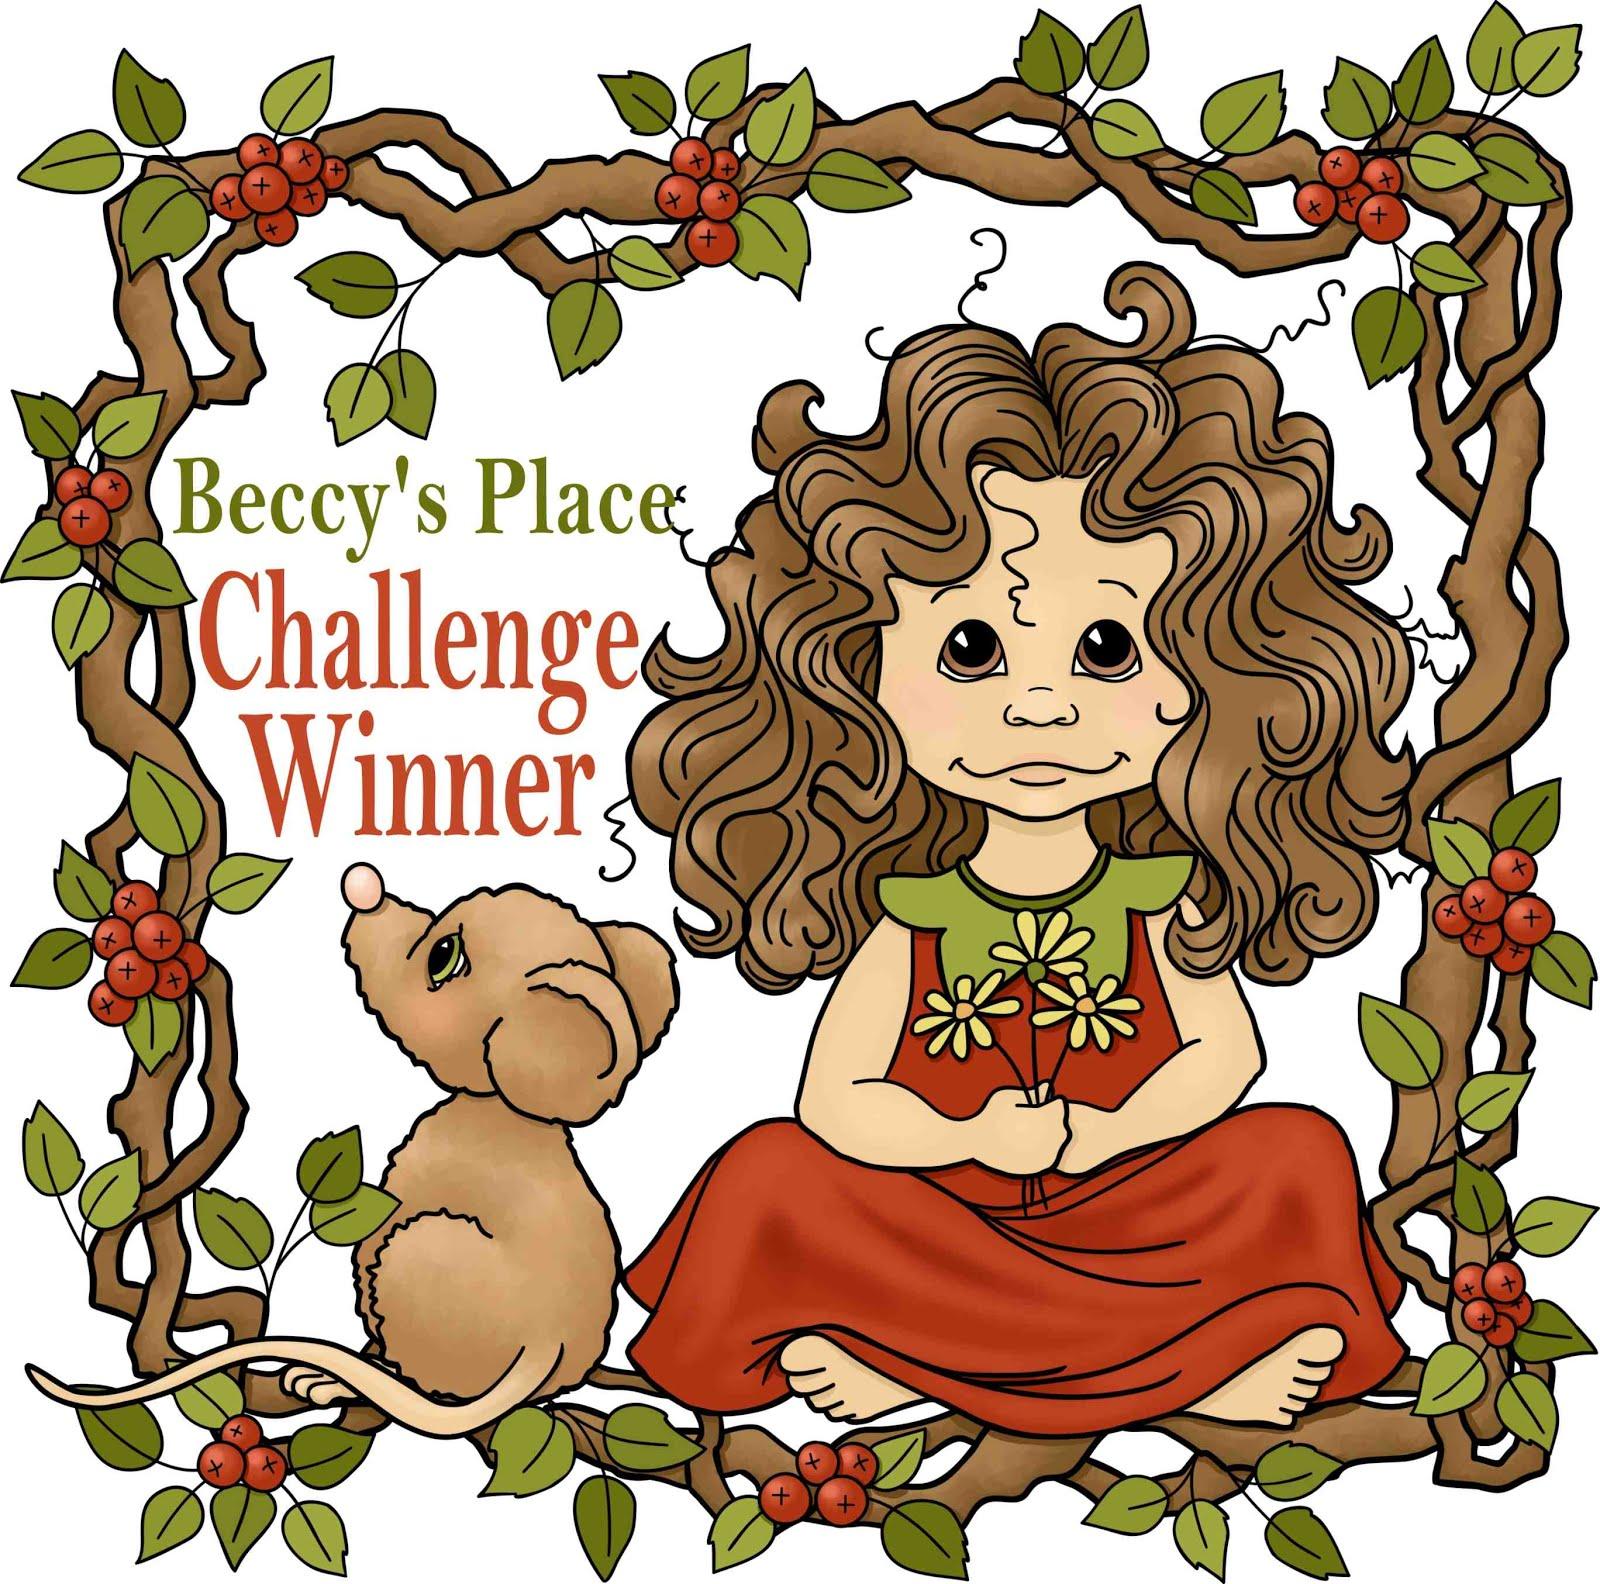 Beccy's Place Random Winner